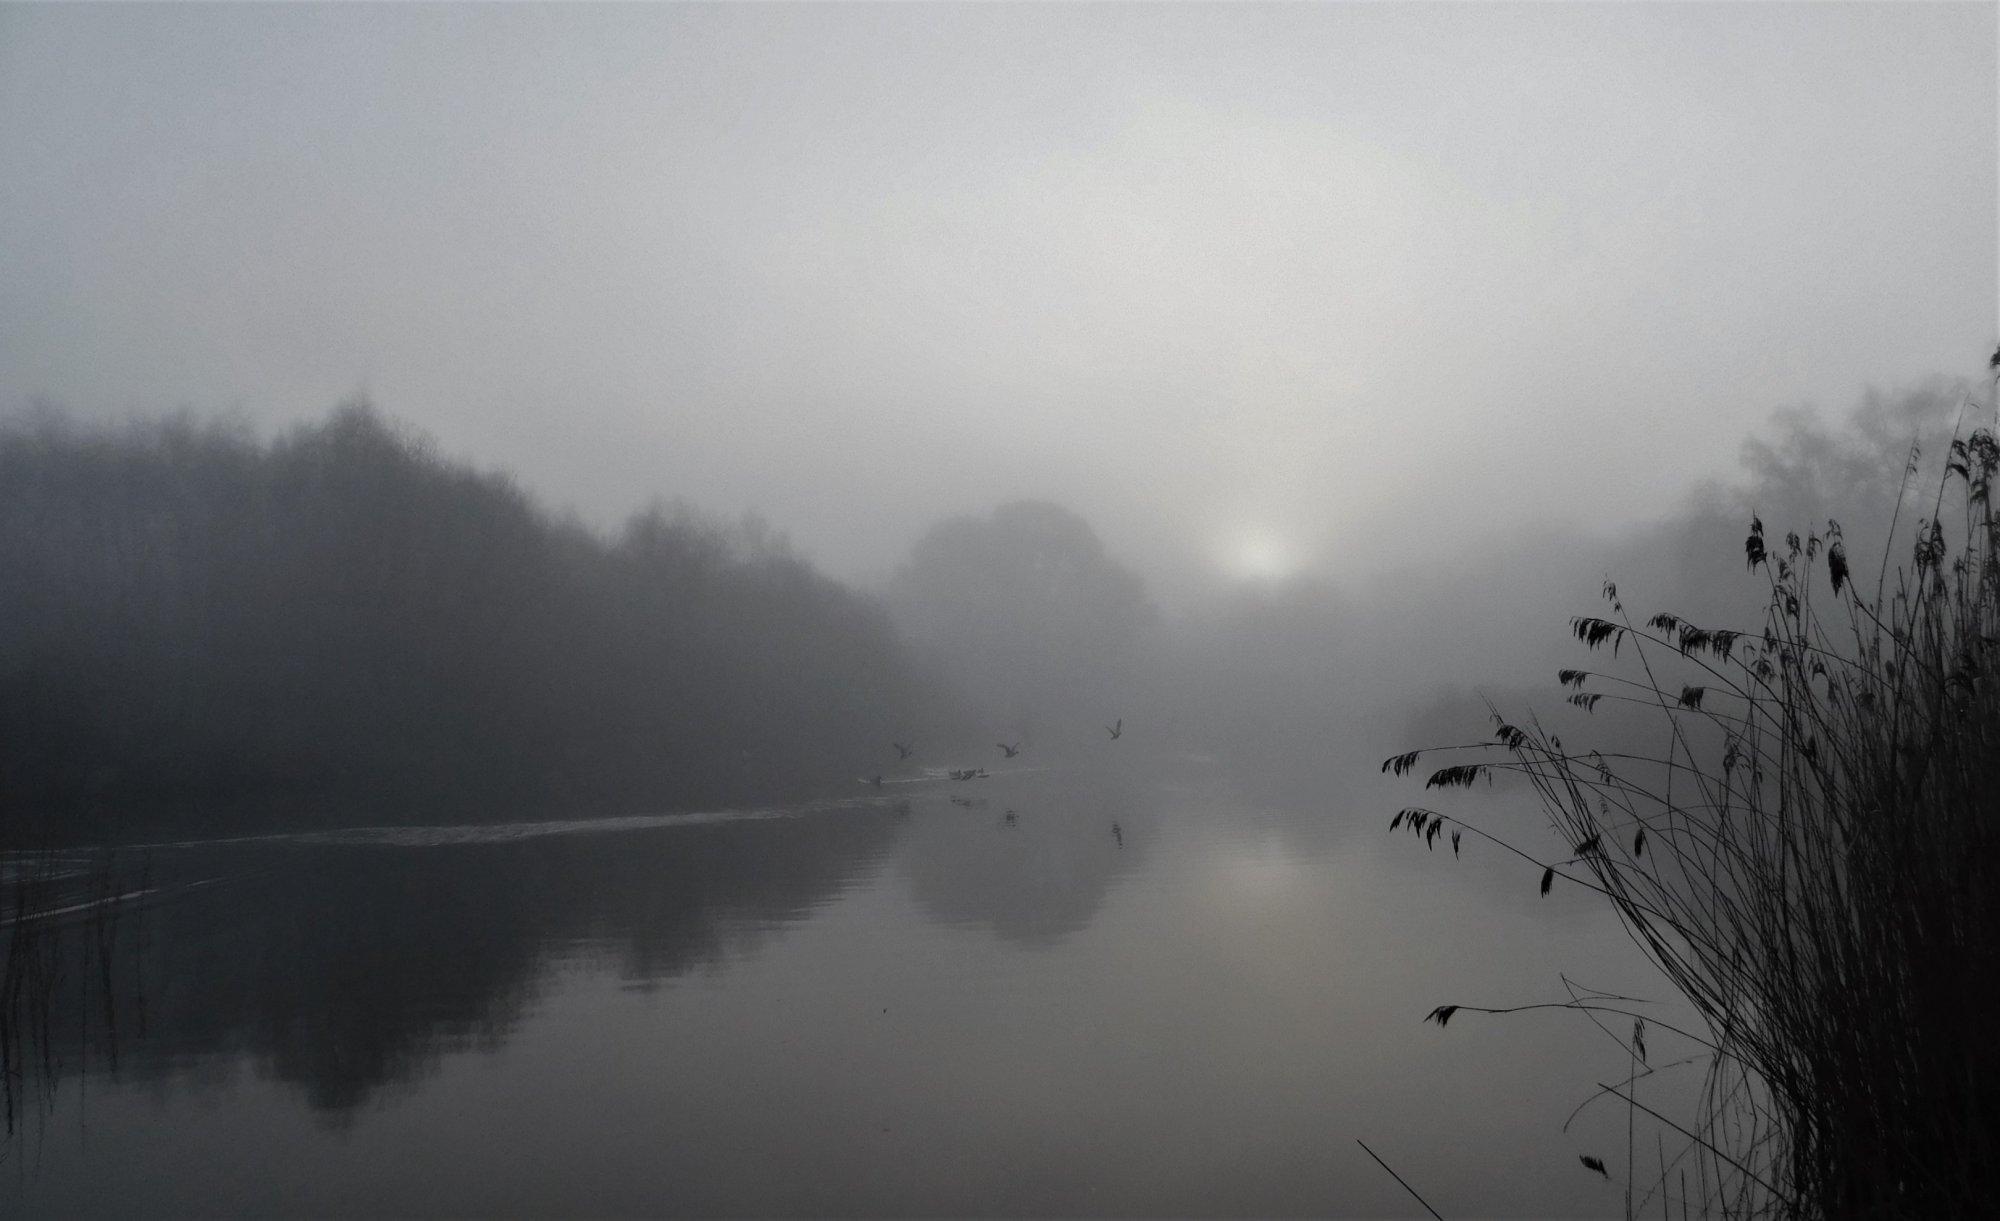 Ornamental lake